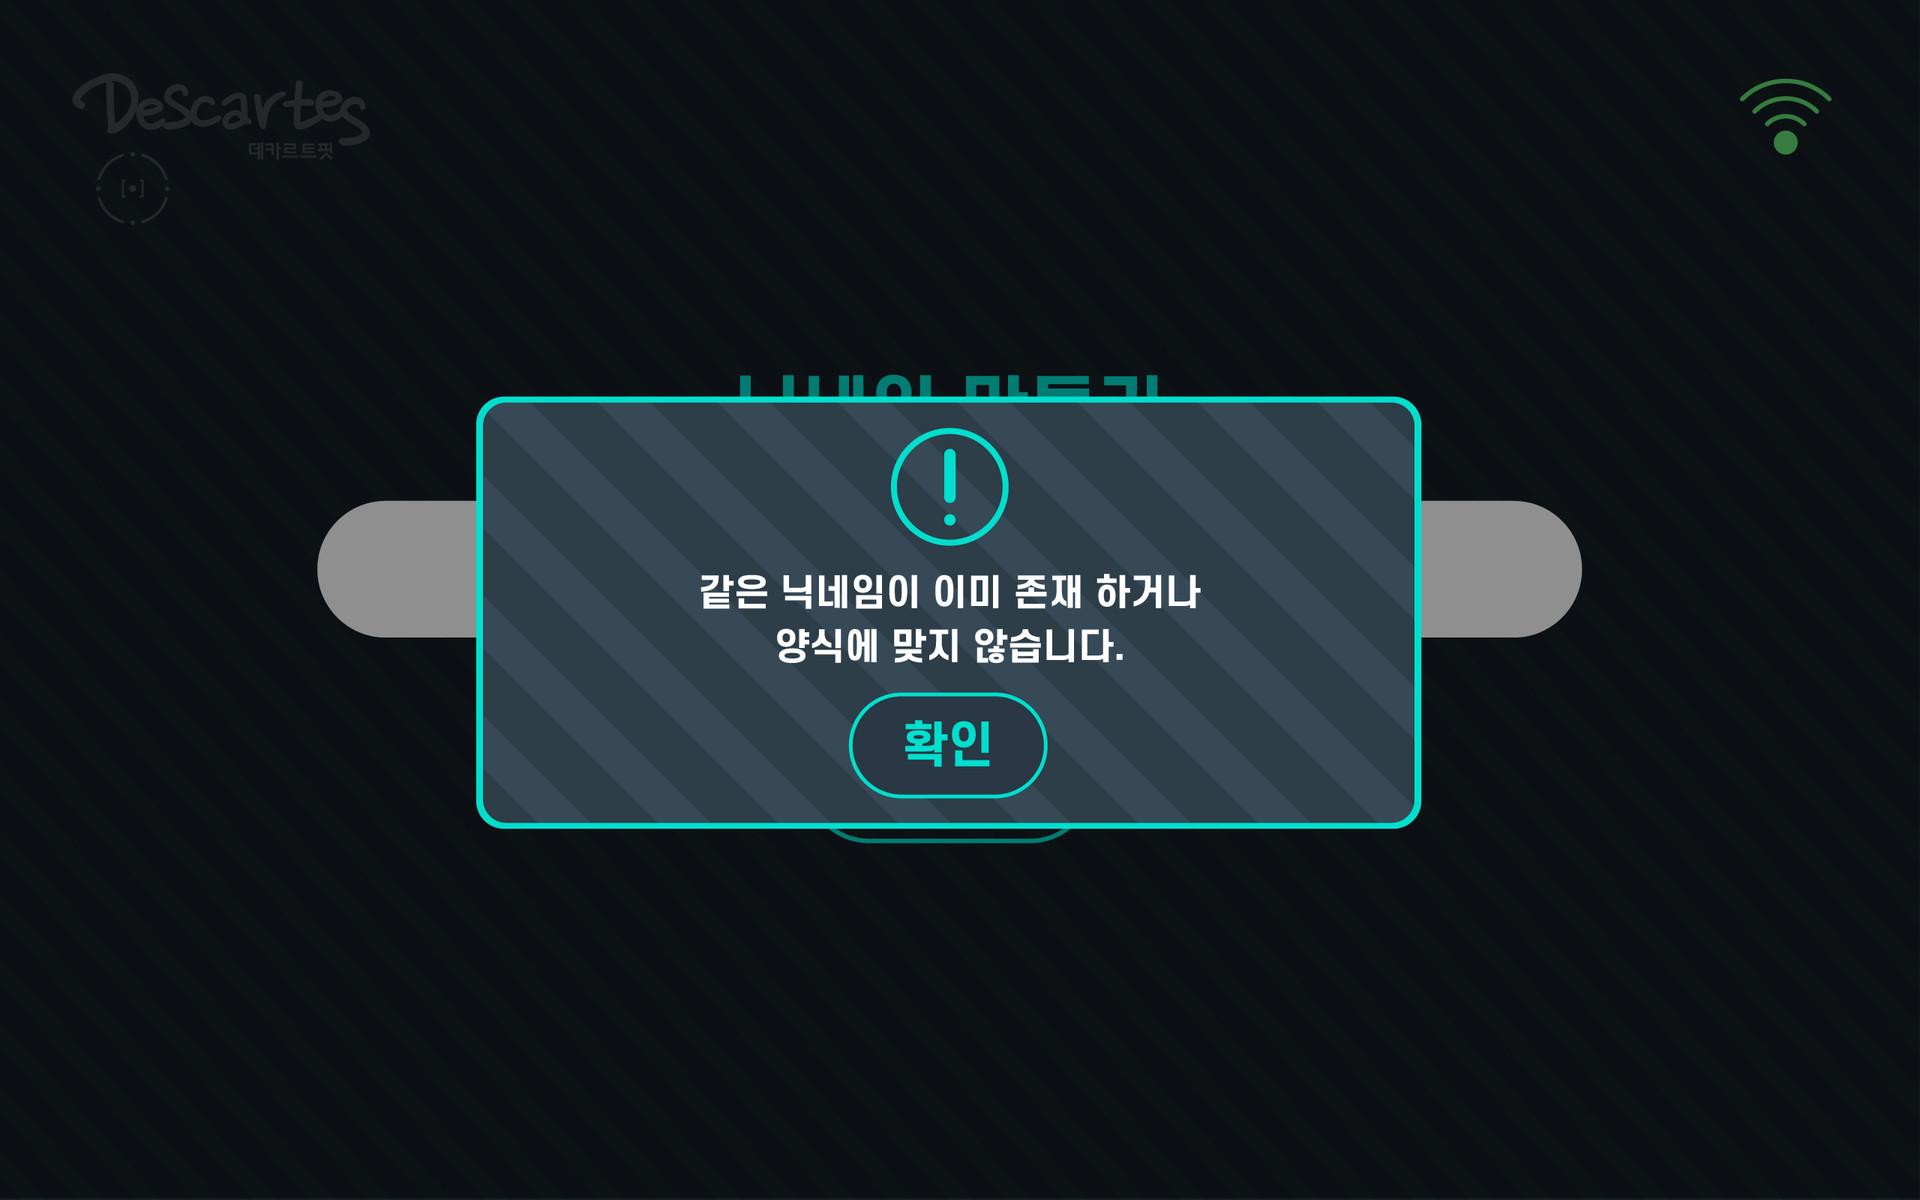 05_main_make_error.jpg